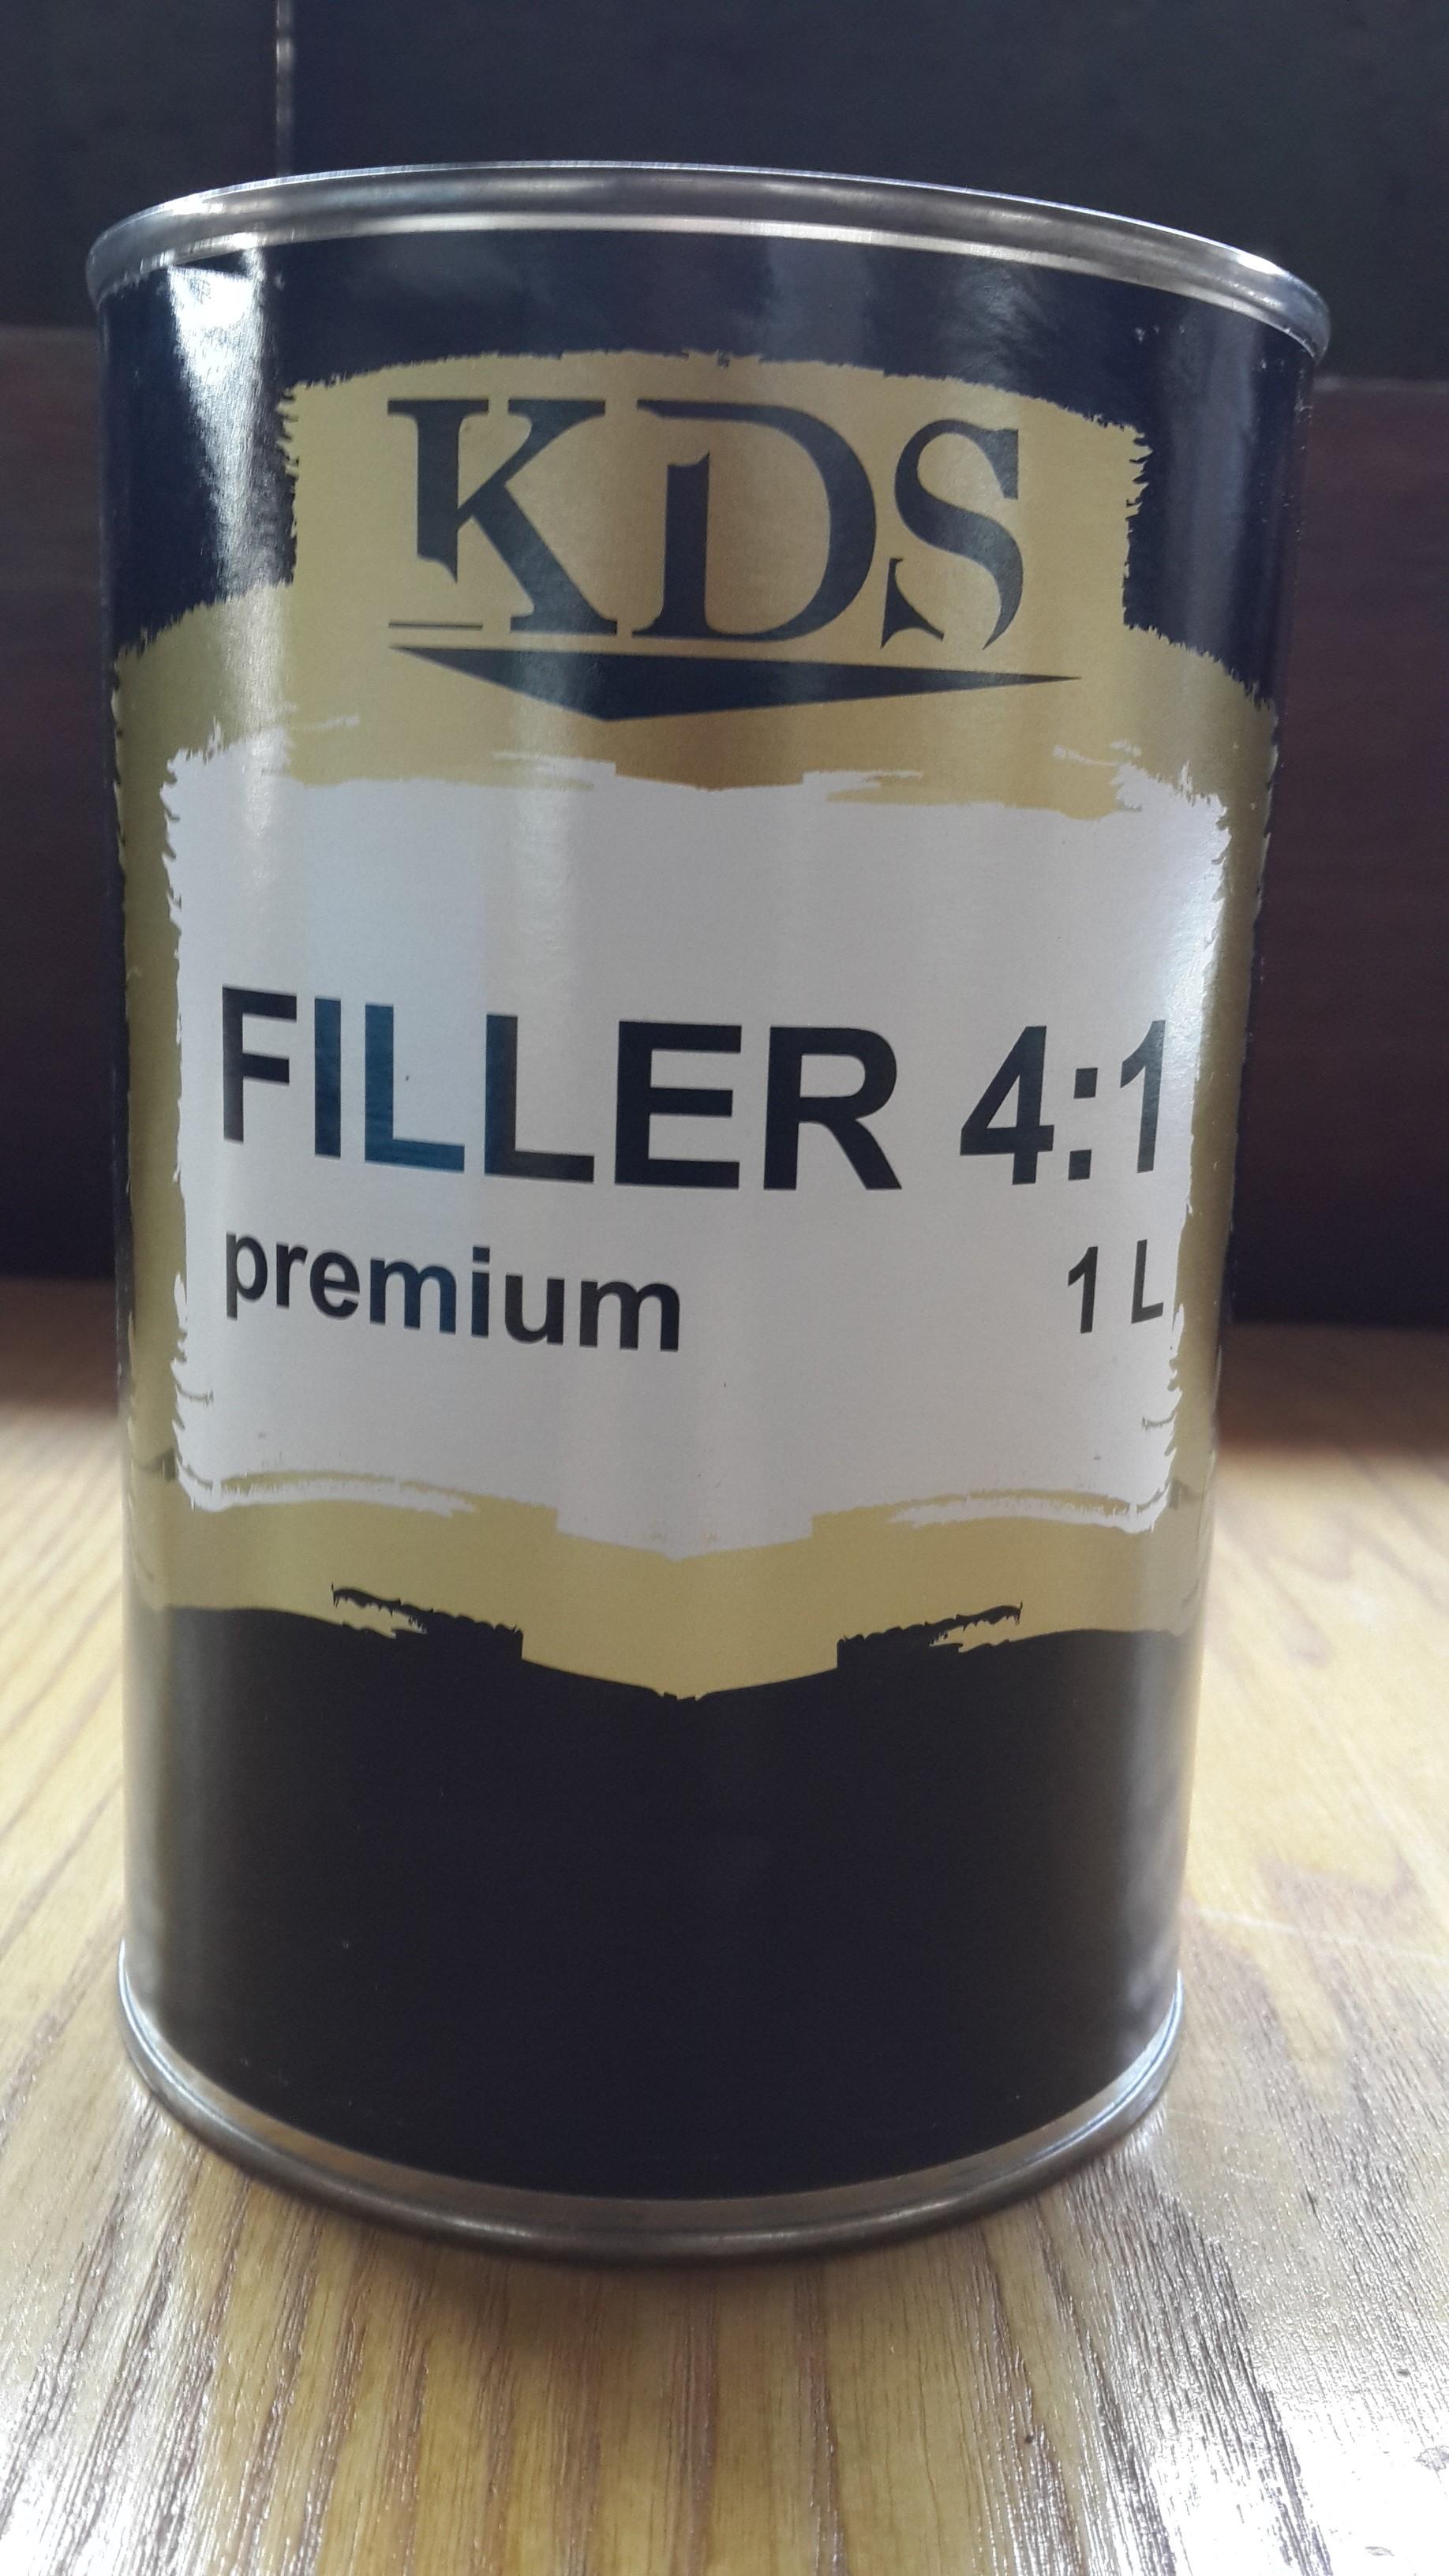 KDS, KDS filler,premium filler,4:1 filler,грунт КДС,грунт для СТО,грунт высокого качества,KDS-Lutsk,матеріали для малярки,матеріали для фарбування,антикорозійні матеріали